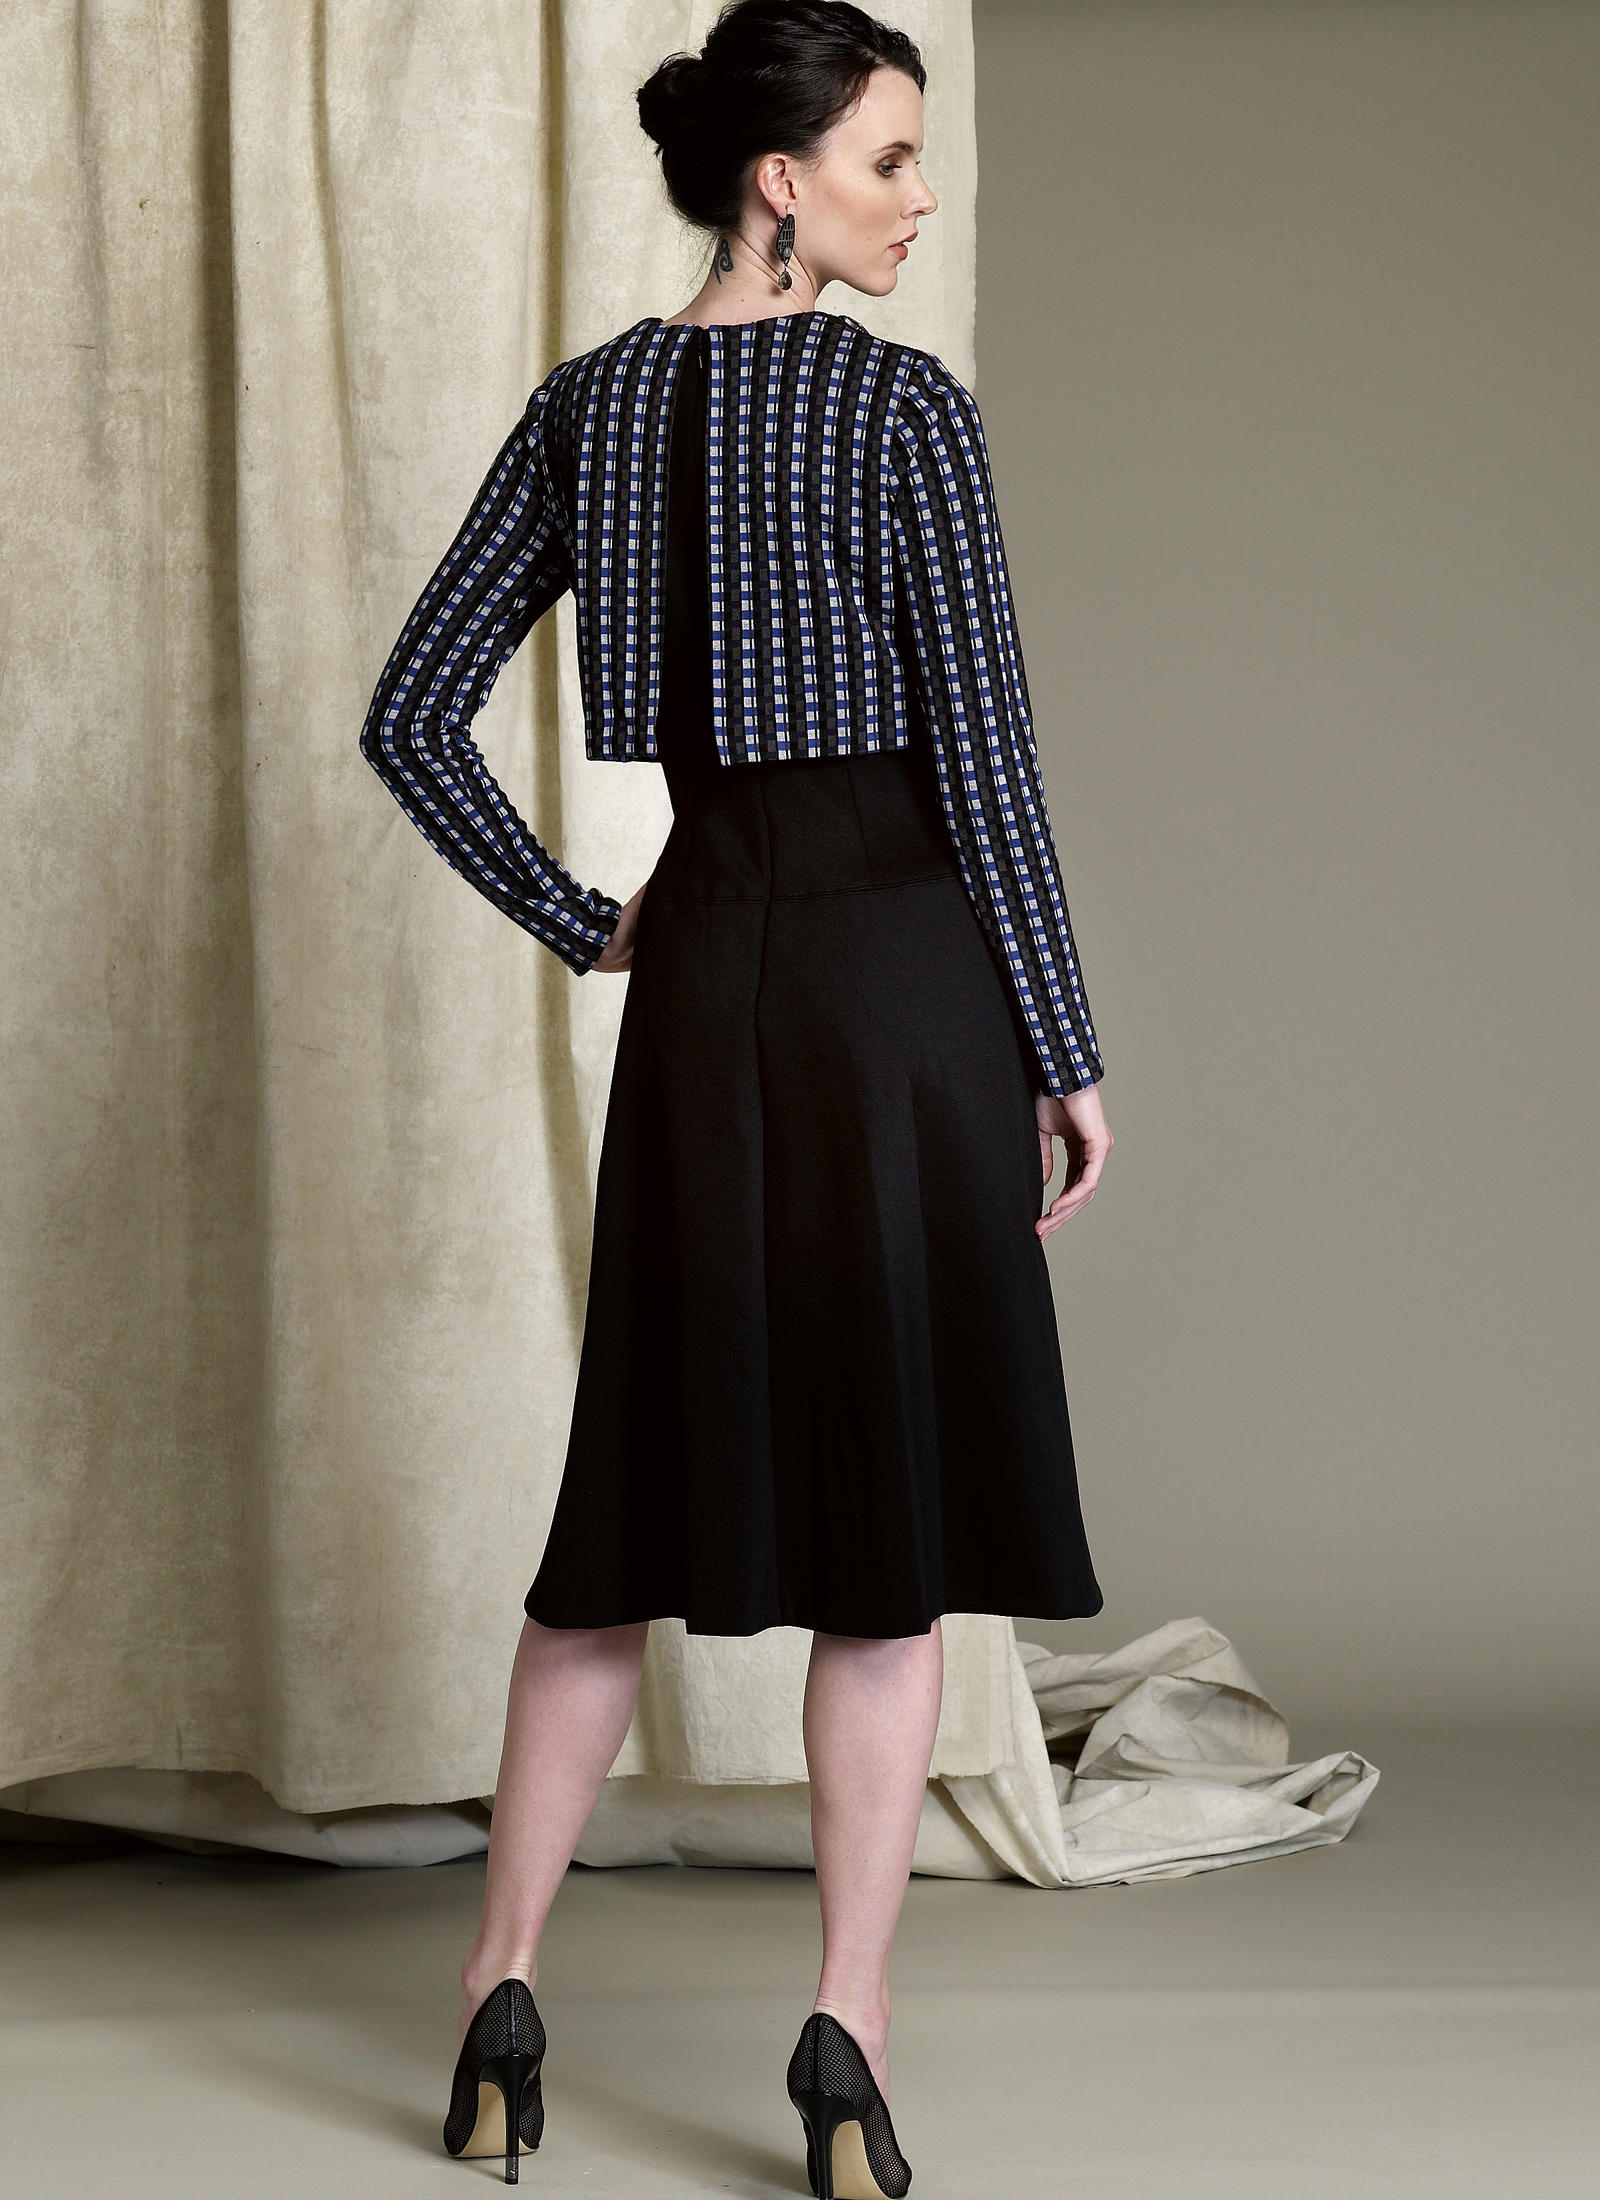 Vogue Patterns 1512 MISSES POPOVER MIDI DRESS sewing pattern